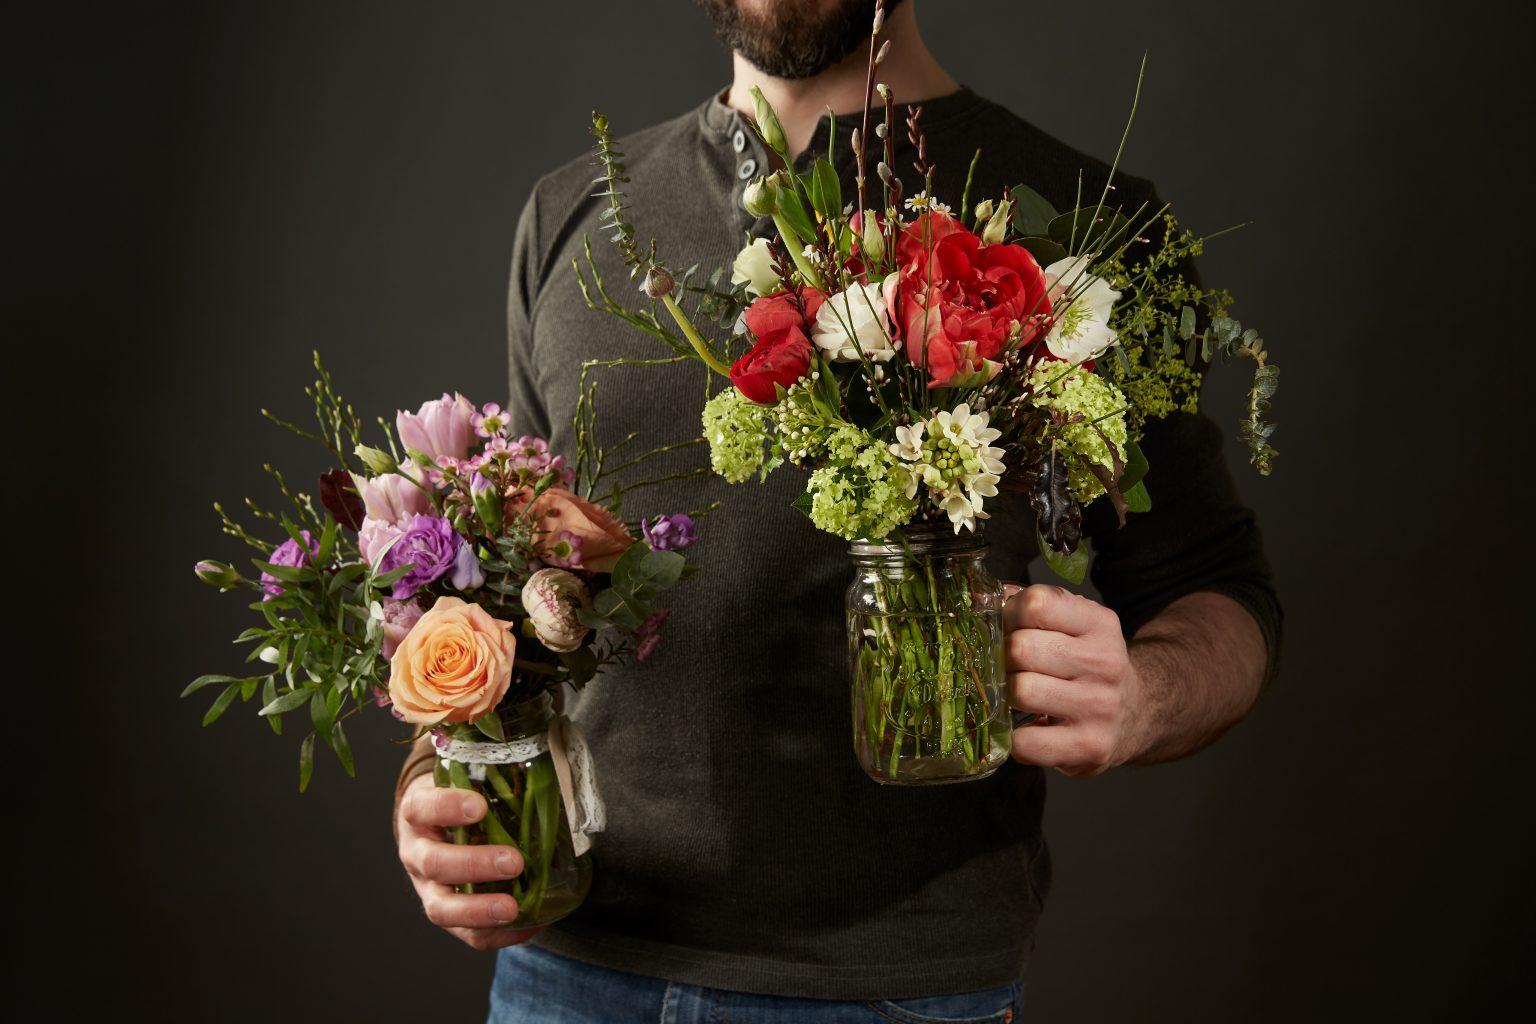 Adonis flowers adonis flower designers patrick street dublin 8 add to basket izmirmasajfo